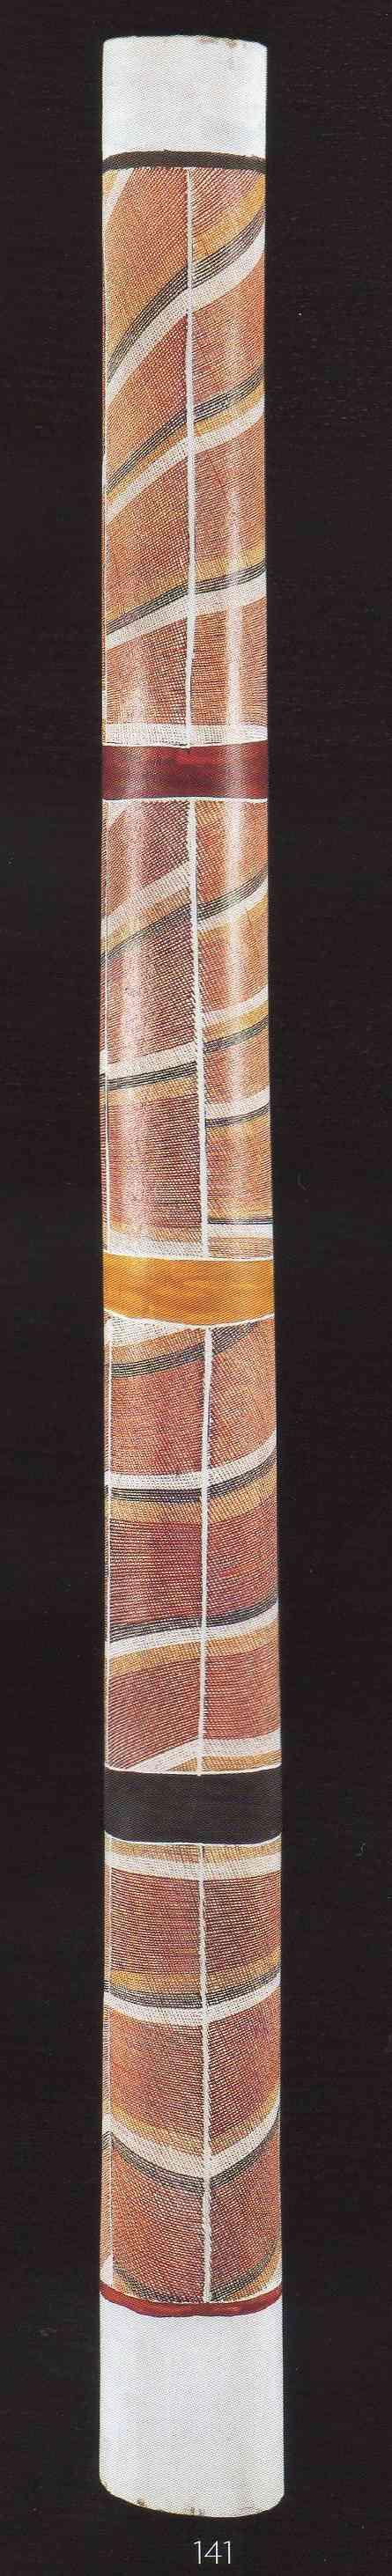 Mowundjal